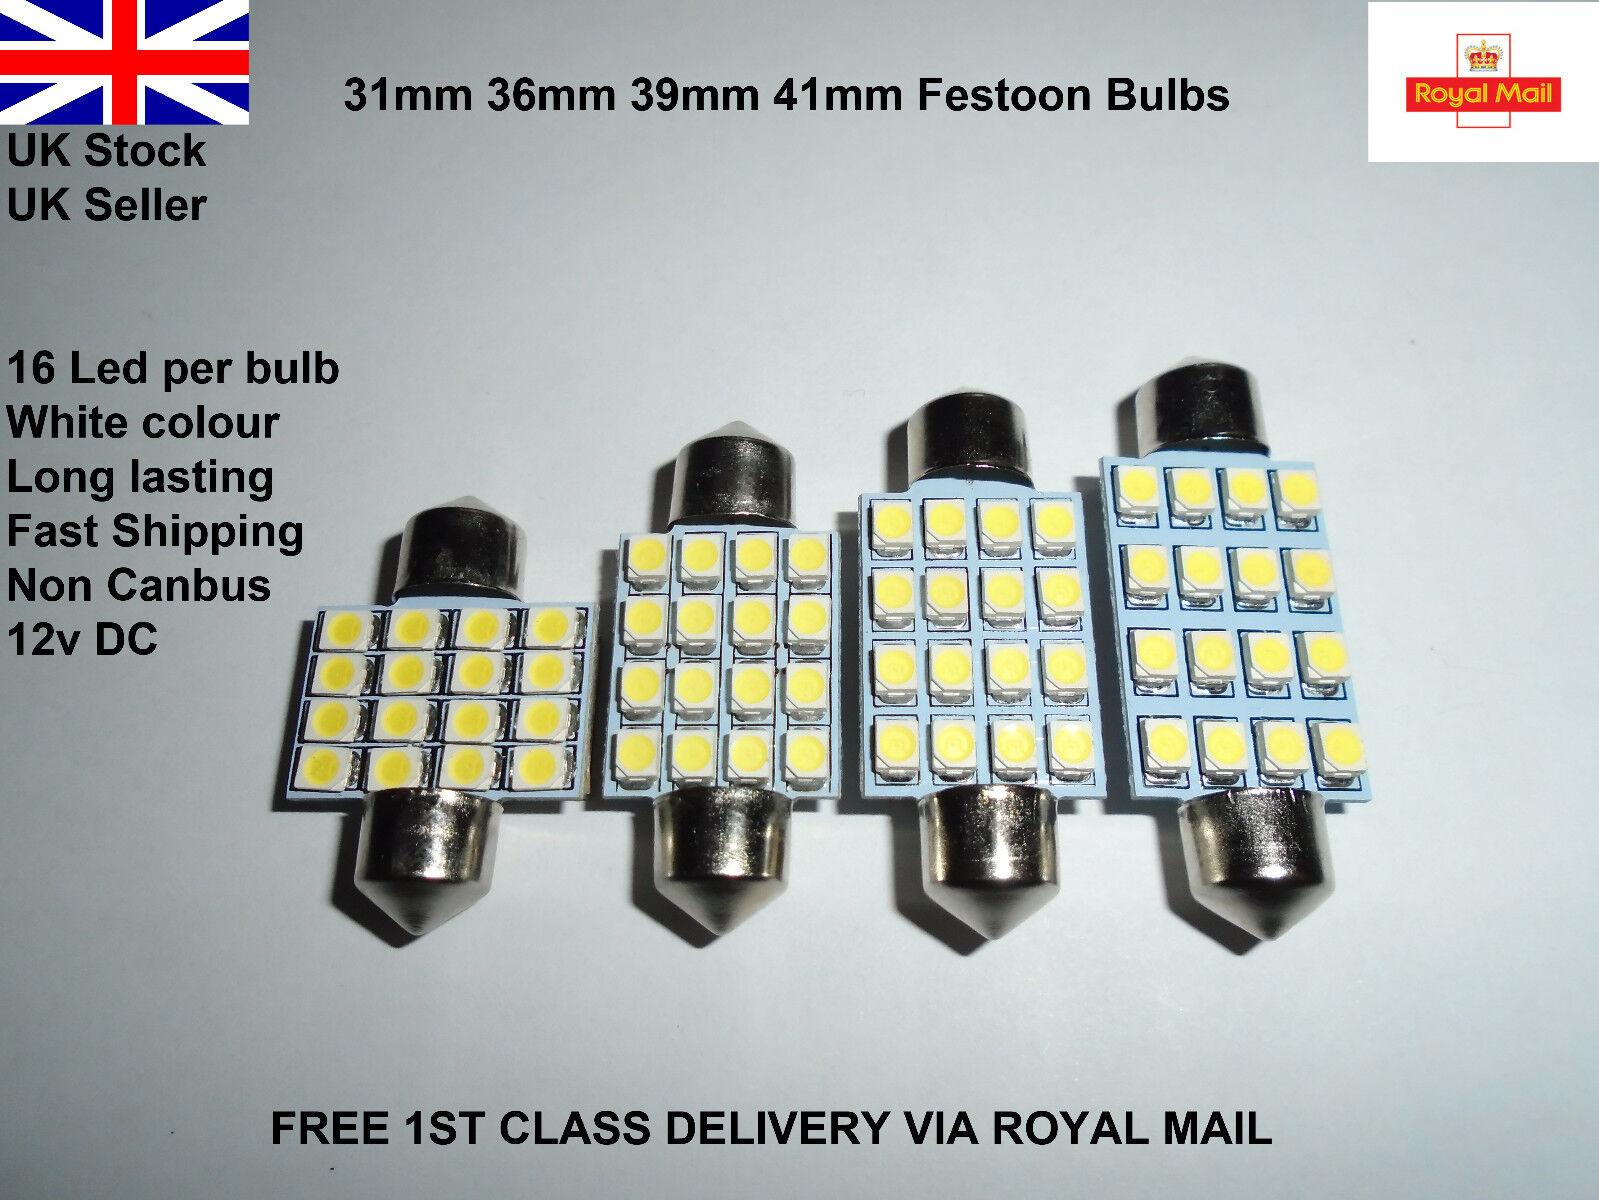 42-44mm 8 LED INTERIOR FESTOON DOME TRUNK CEILING LIGHT LAMPS BULBS SV8.5